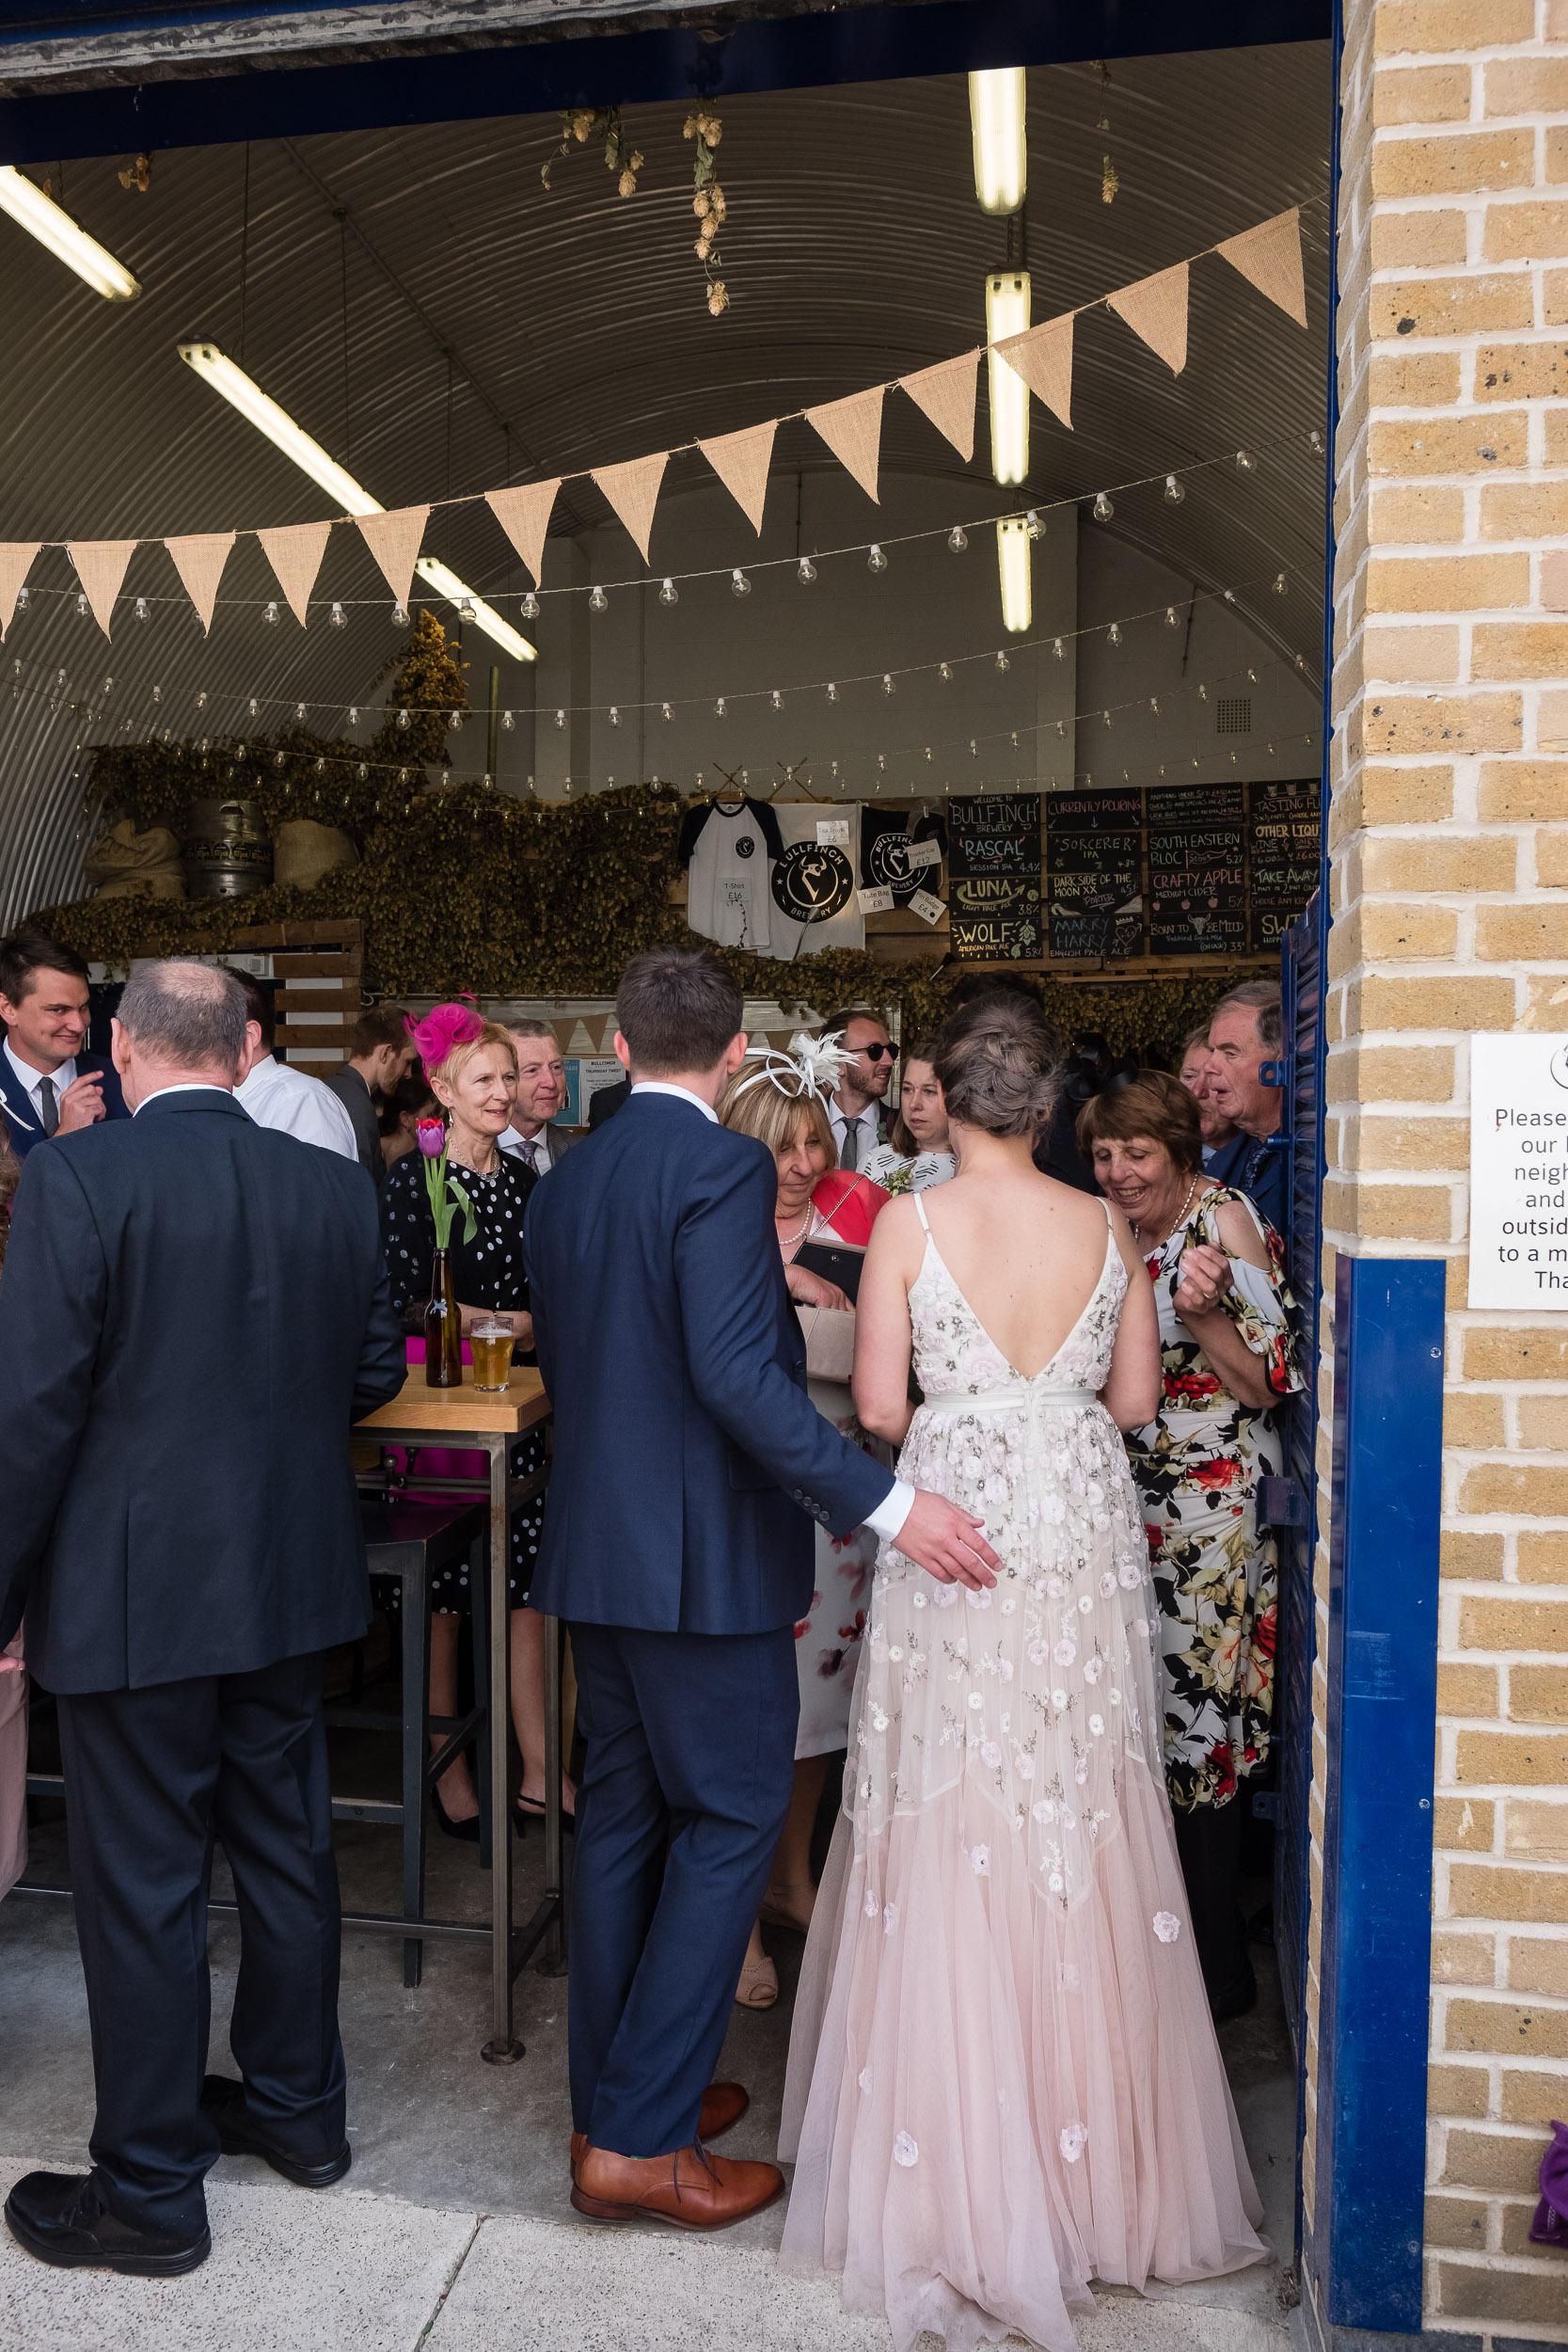 brockwell-lido-brixton-herne-hill-wedding-053.jpg